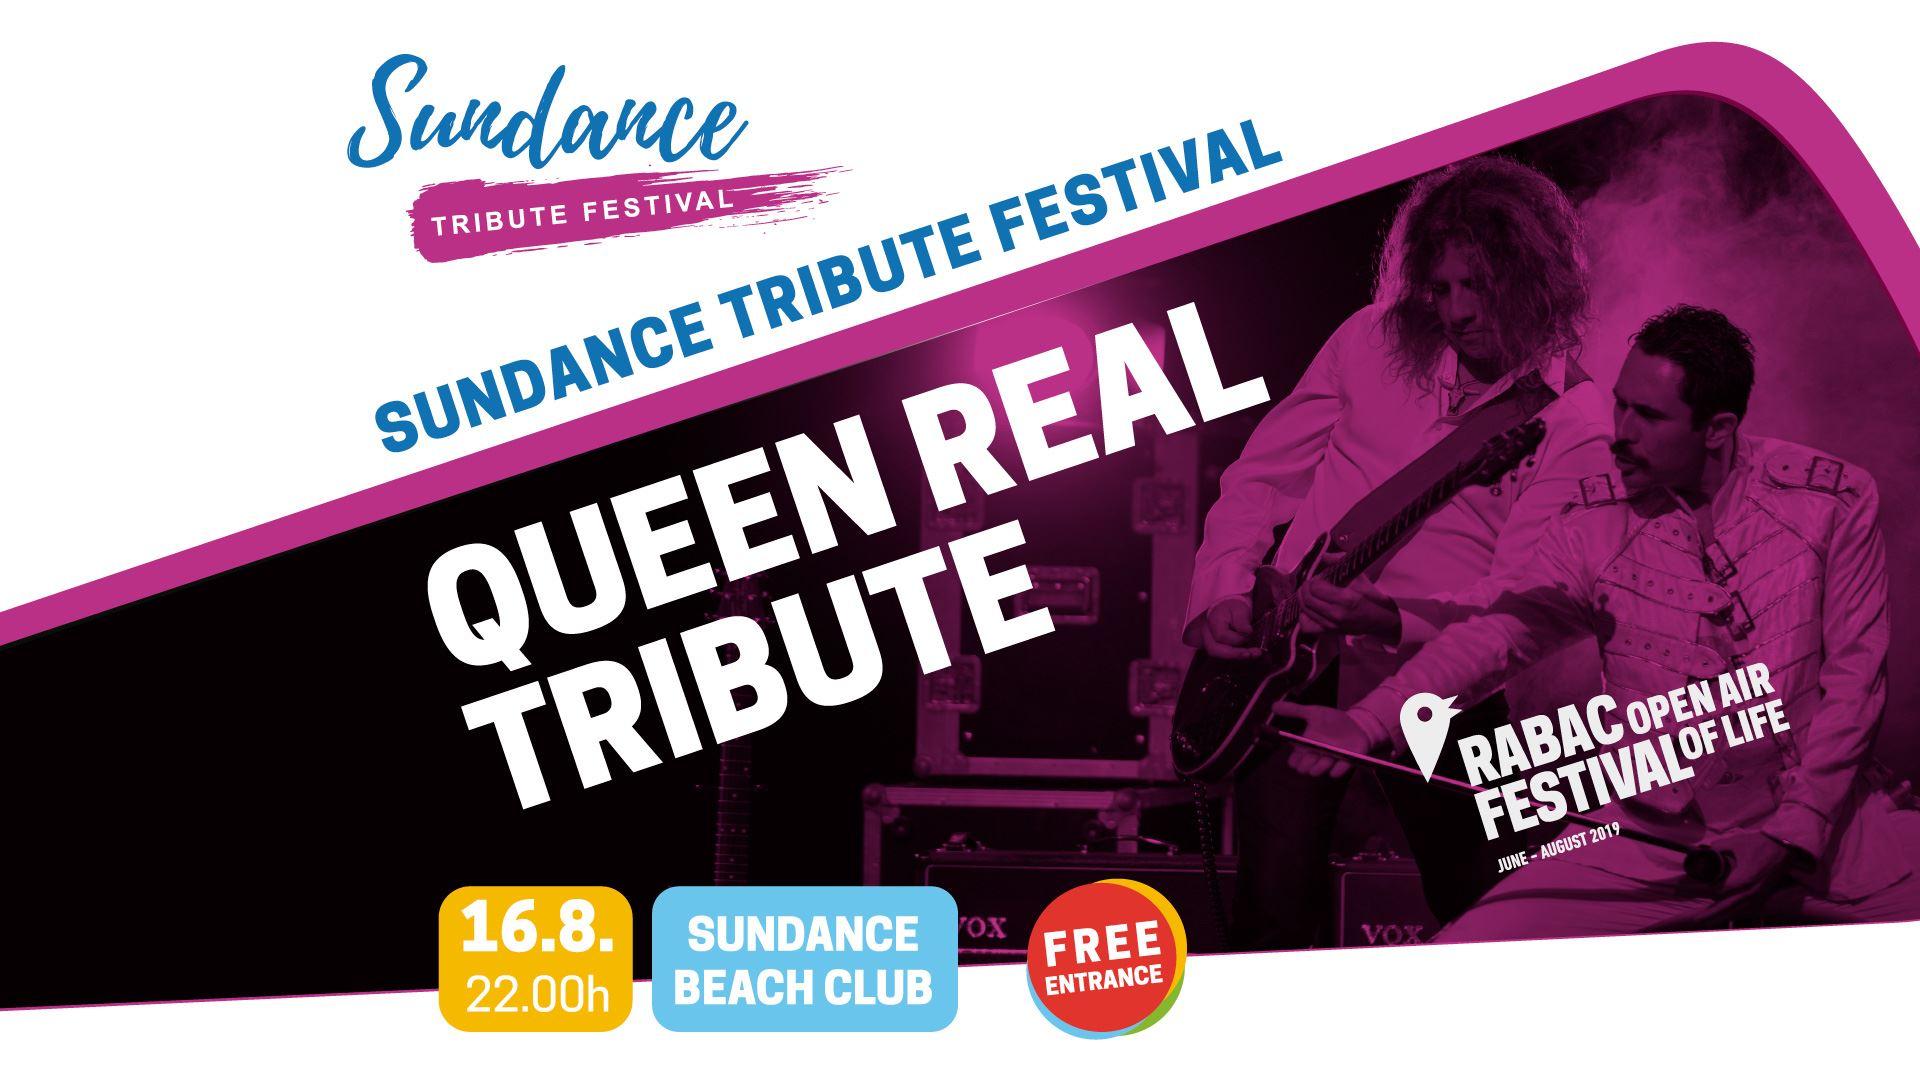 Sundance Tribute Festival - Queen Tribute Band